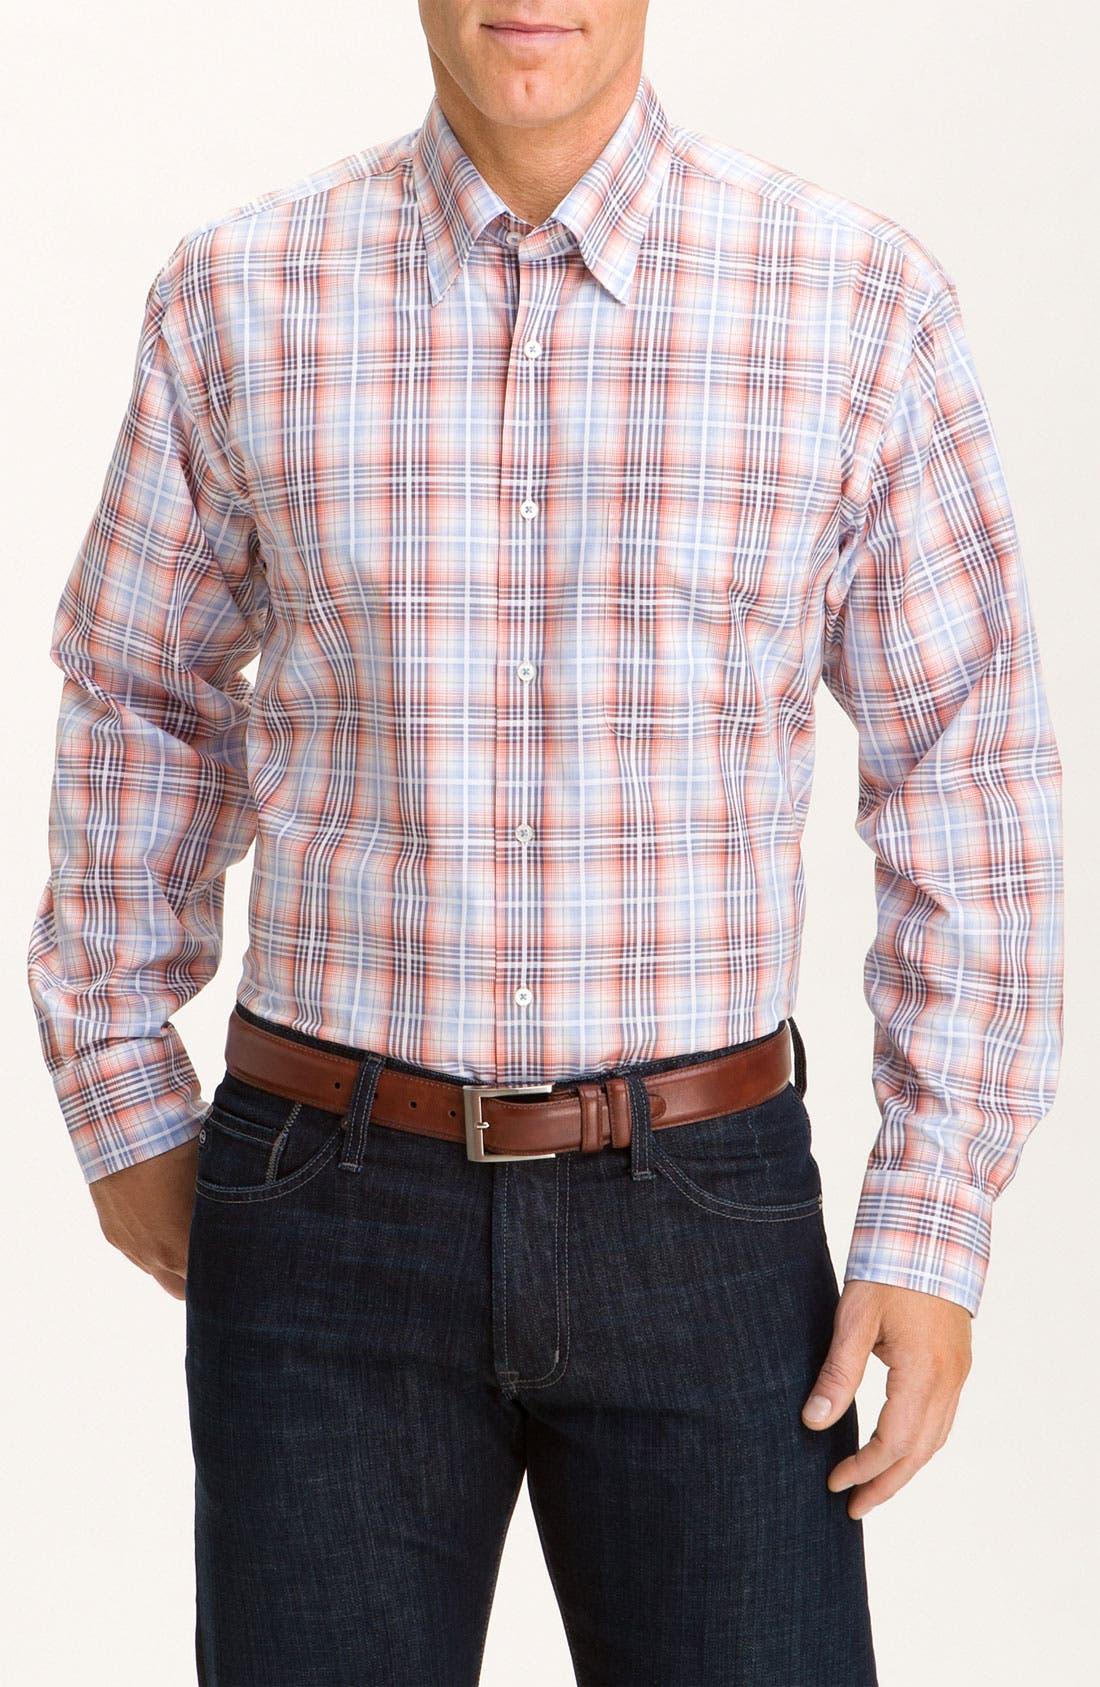 Main Image - Robert Talbott Plaid Sport Shirt